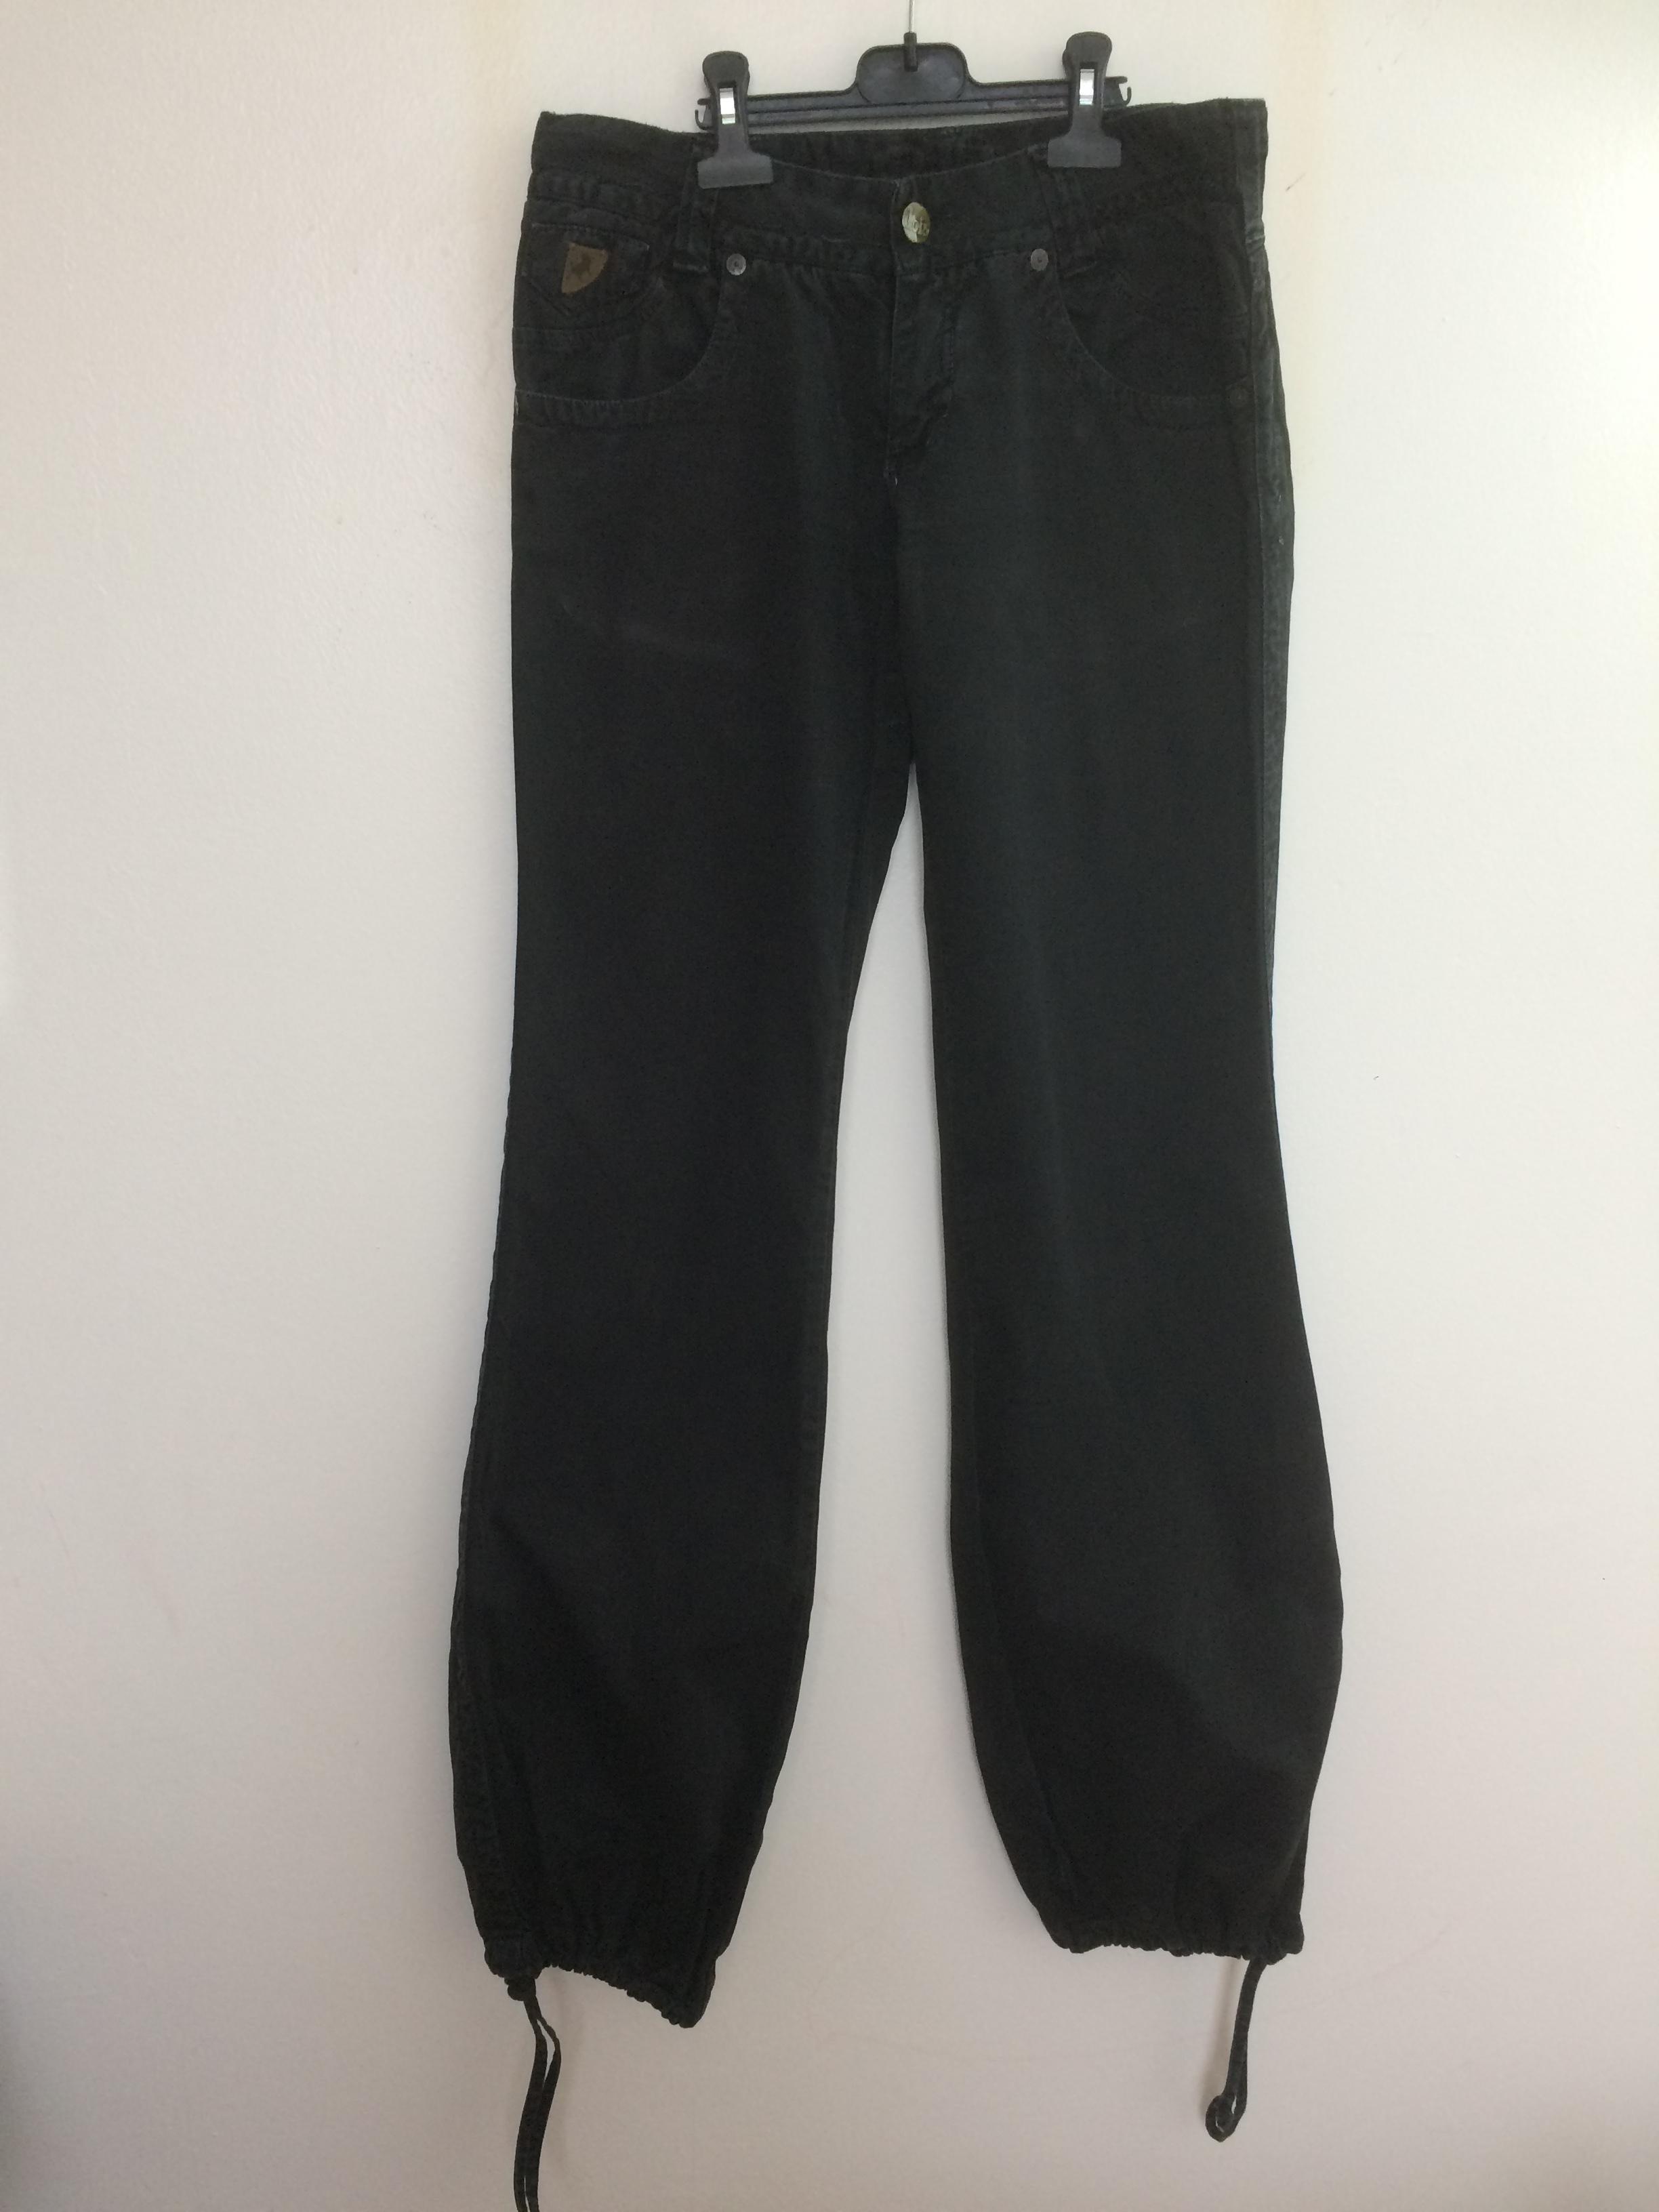 troc de troc jean noir 29 us = 38/39 fr image 0